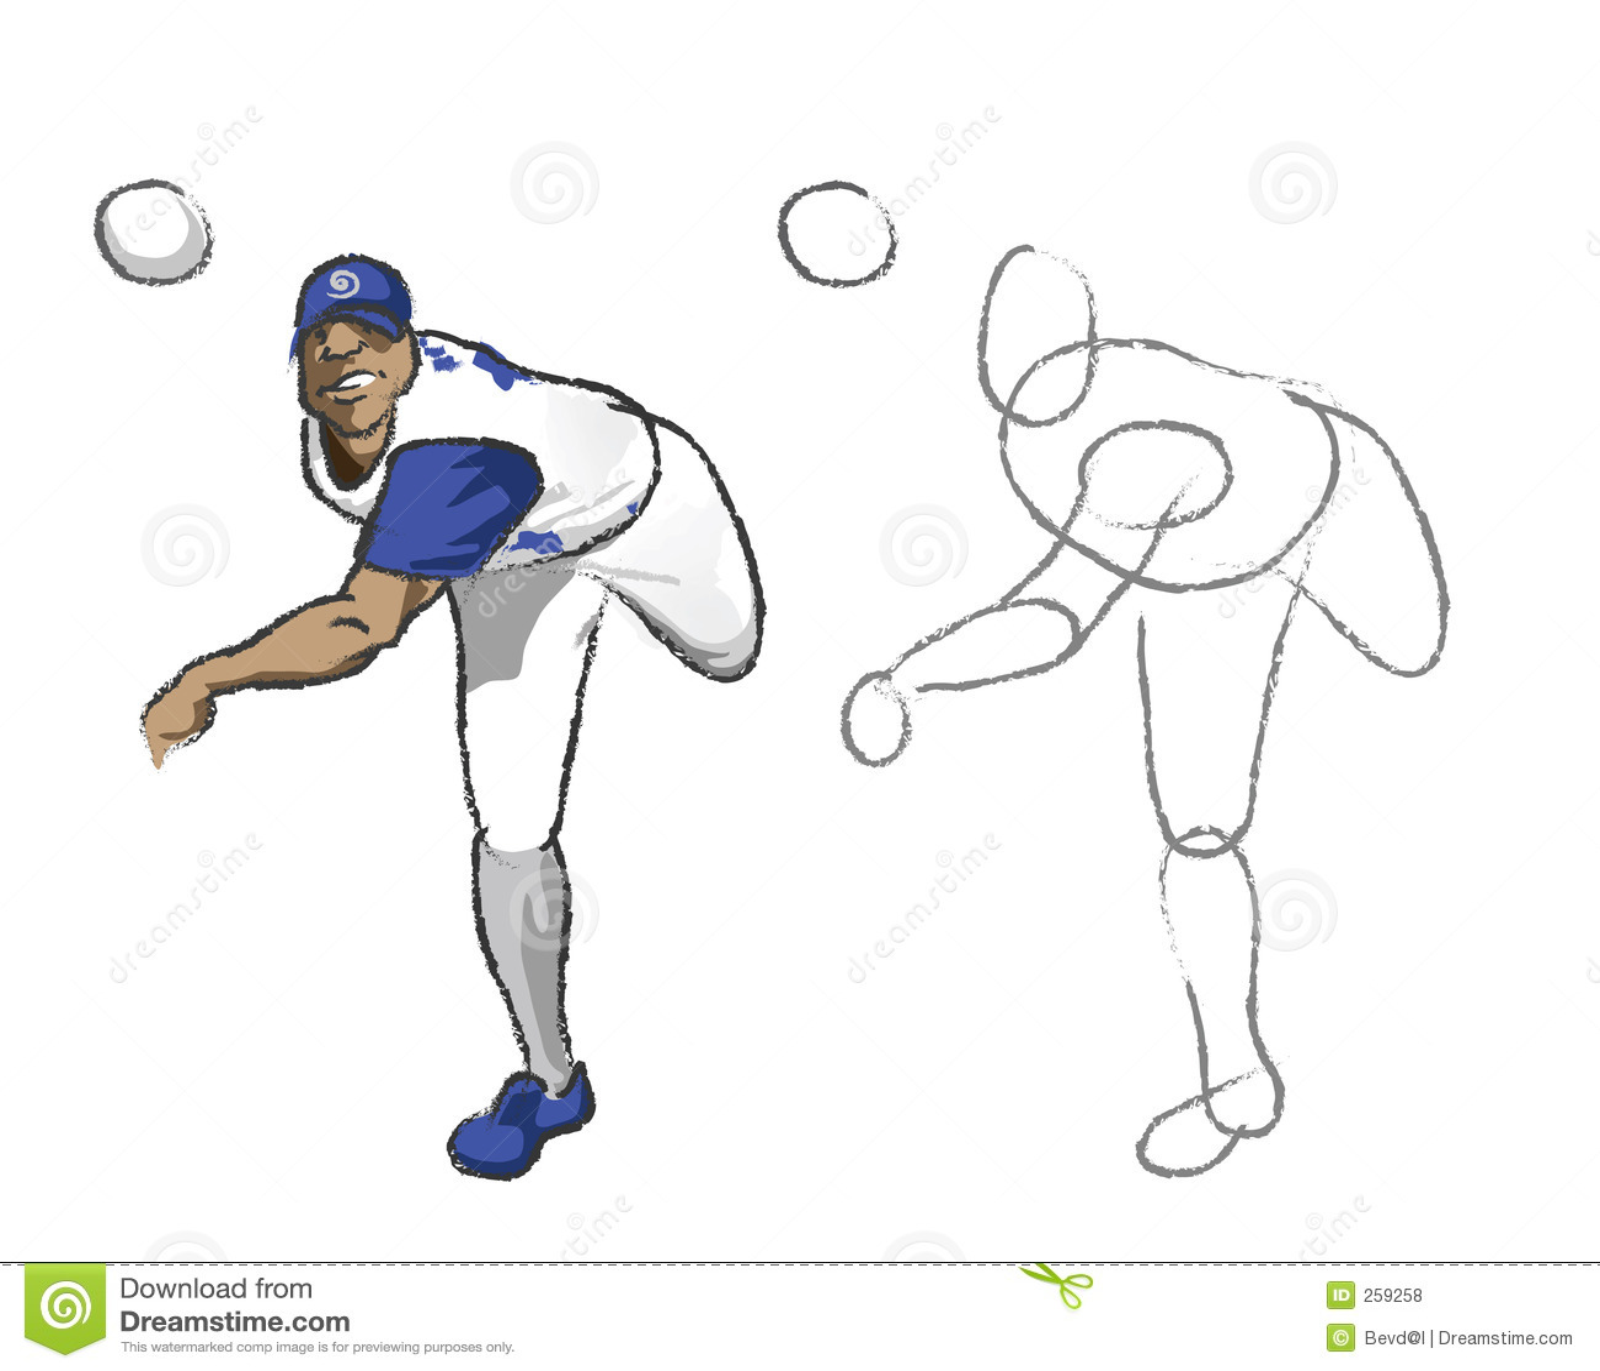 Uncategorized How To Draw A Baseball Pitcher illustration baseball player royalty free stock photos image photo